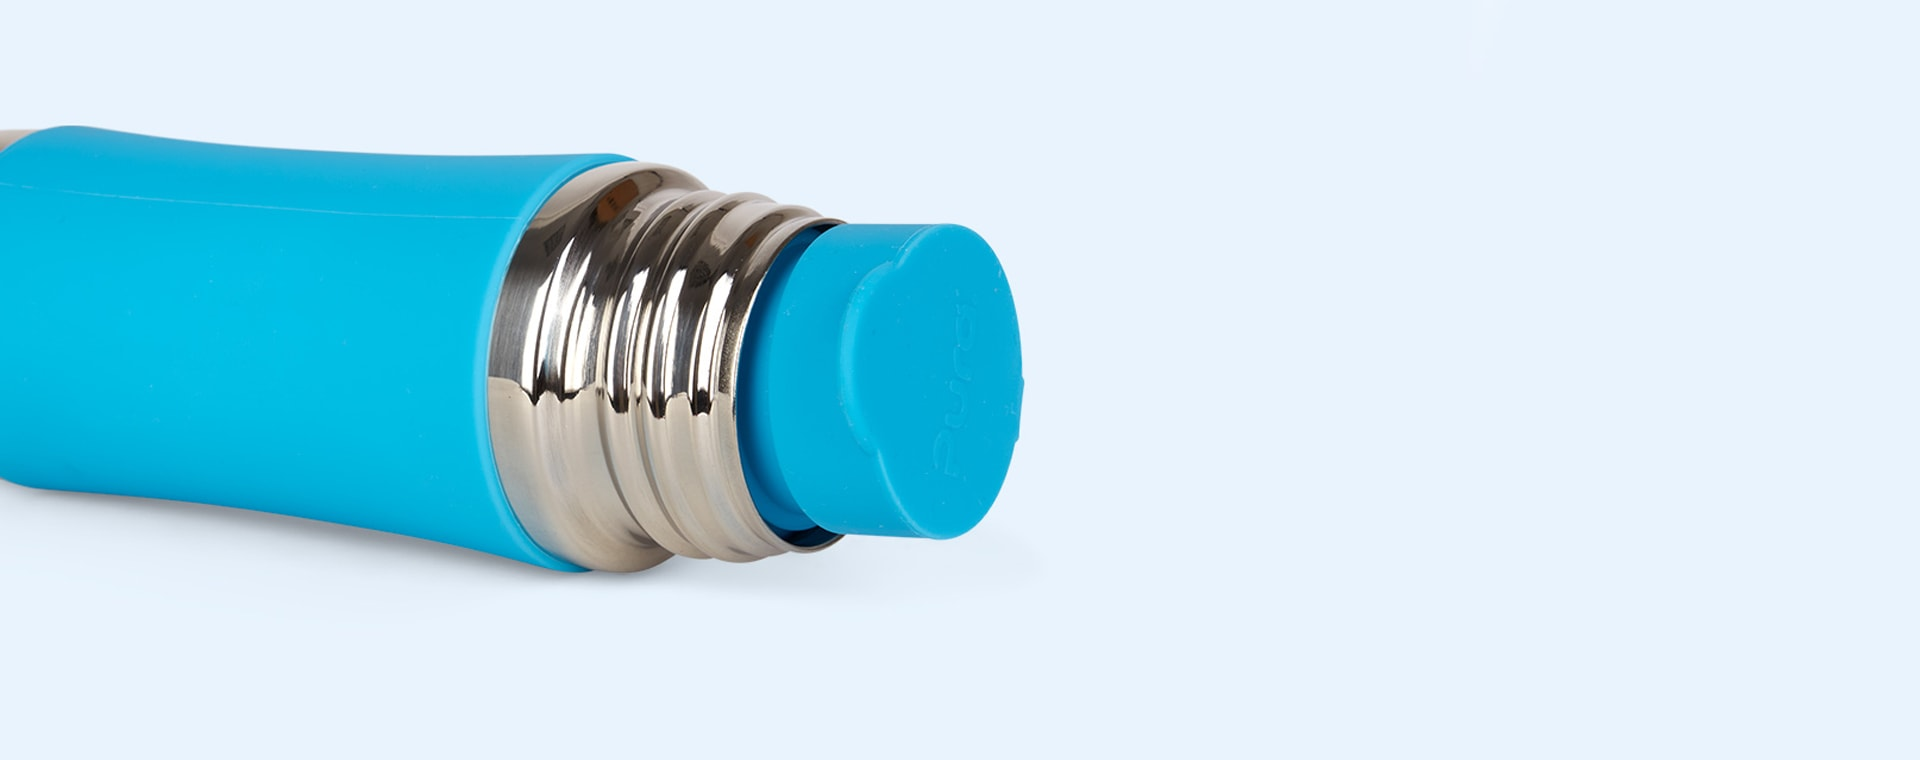 Aqua Pura Silicone Straw Component and Inner